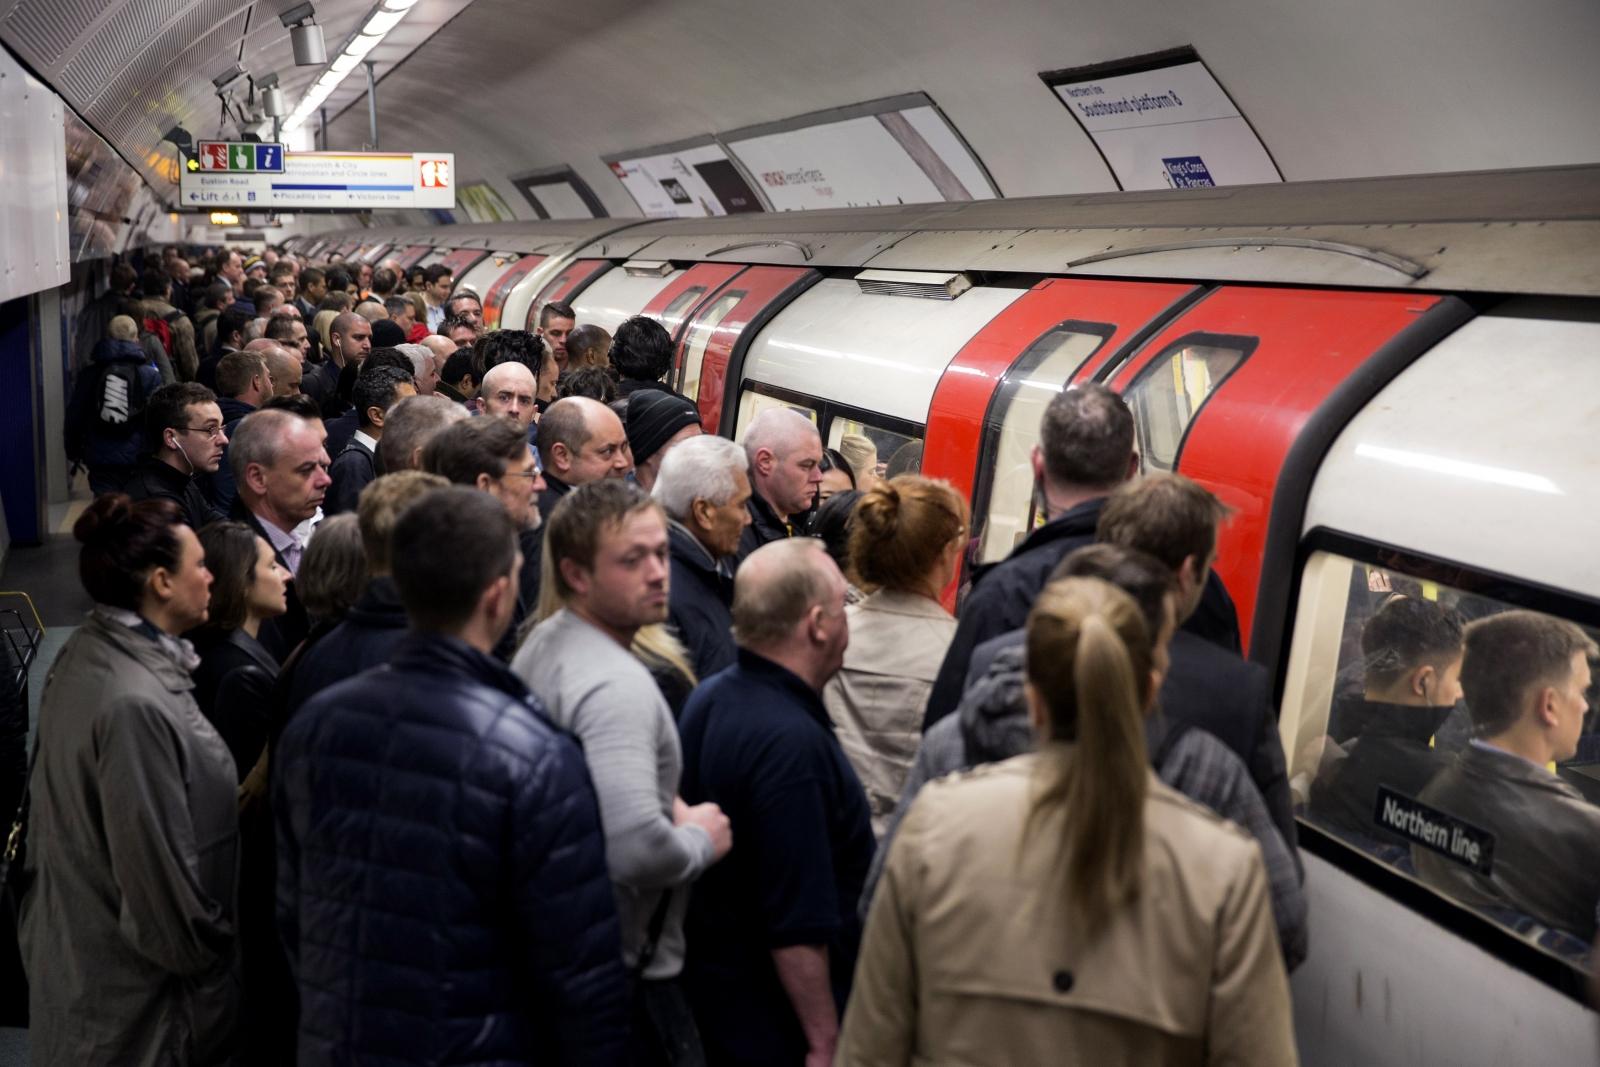 tube strike london underground